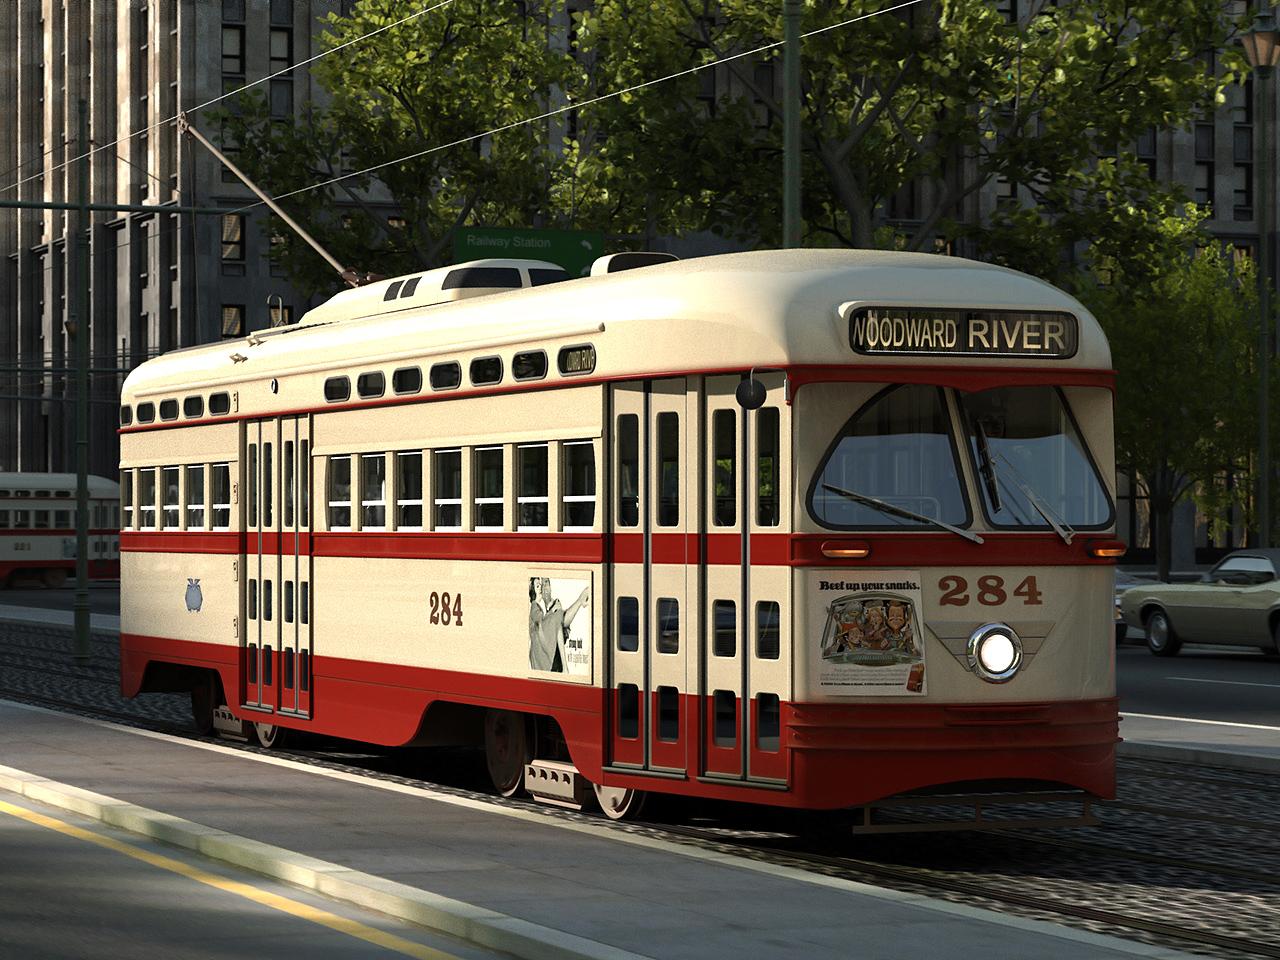 tramvia pcc model 1945 3d 3ds màx fbx c4d obj 163976